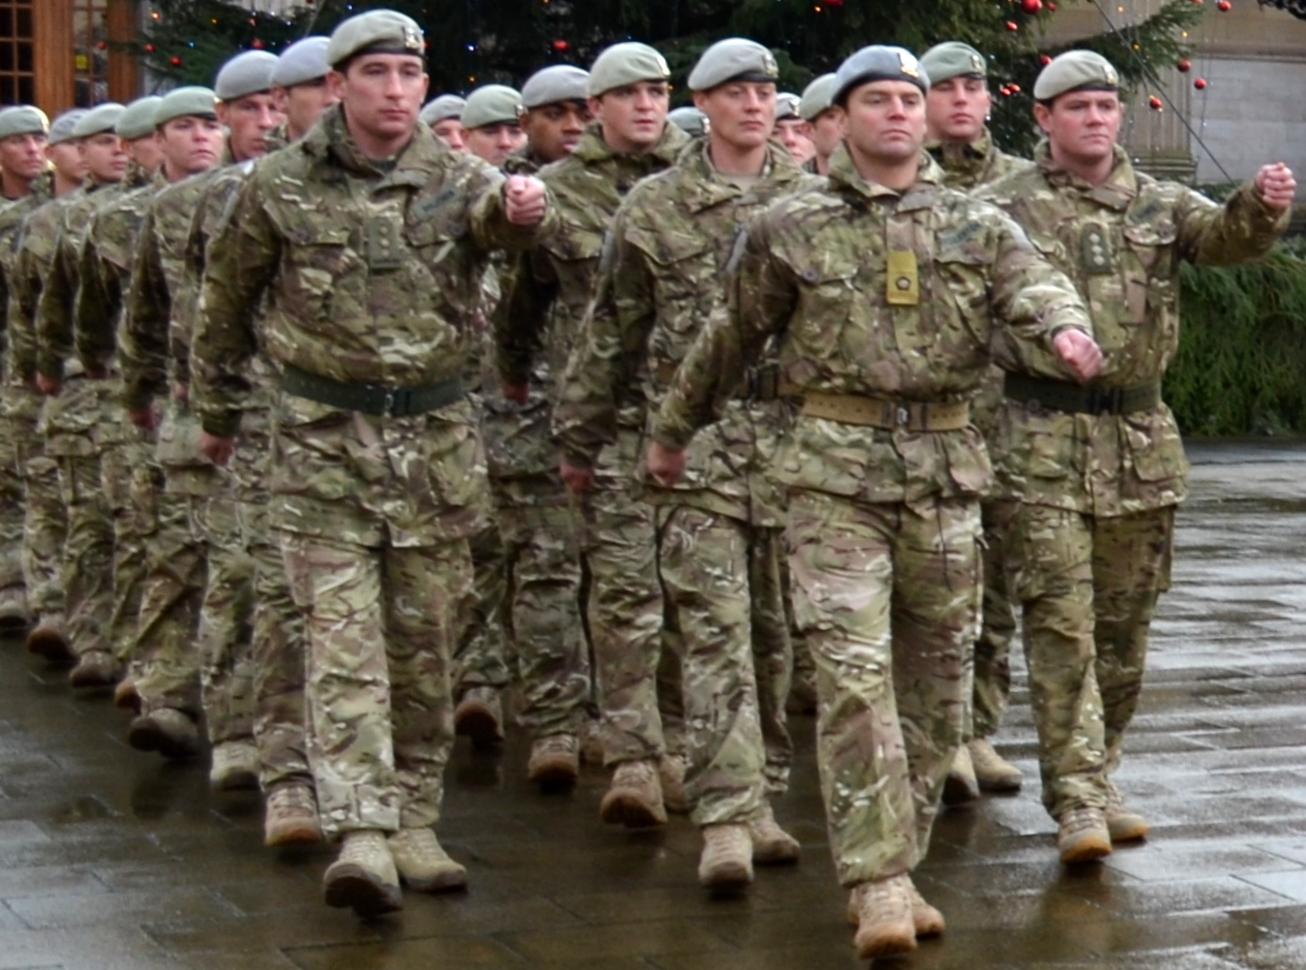 http://2.bp.blogspot.com/-idim27GgD98/TtUq4rvw7PI/AAAAAAAAr0c/MN0fDZpwUEM/s1600/Tour+Scotland+Photograph+Royal+Scots+Dragoon+Guards+Soldiers+City+Square+Dundee+Scotland+November+29th.jpg